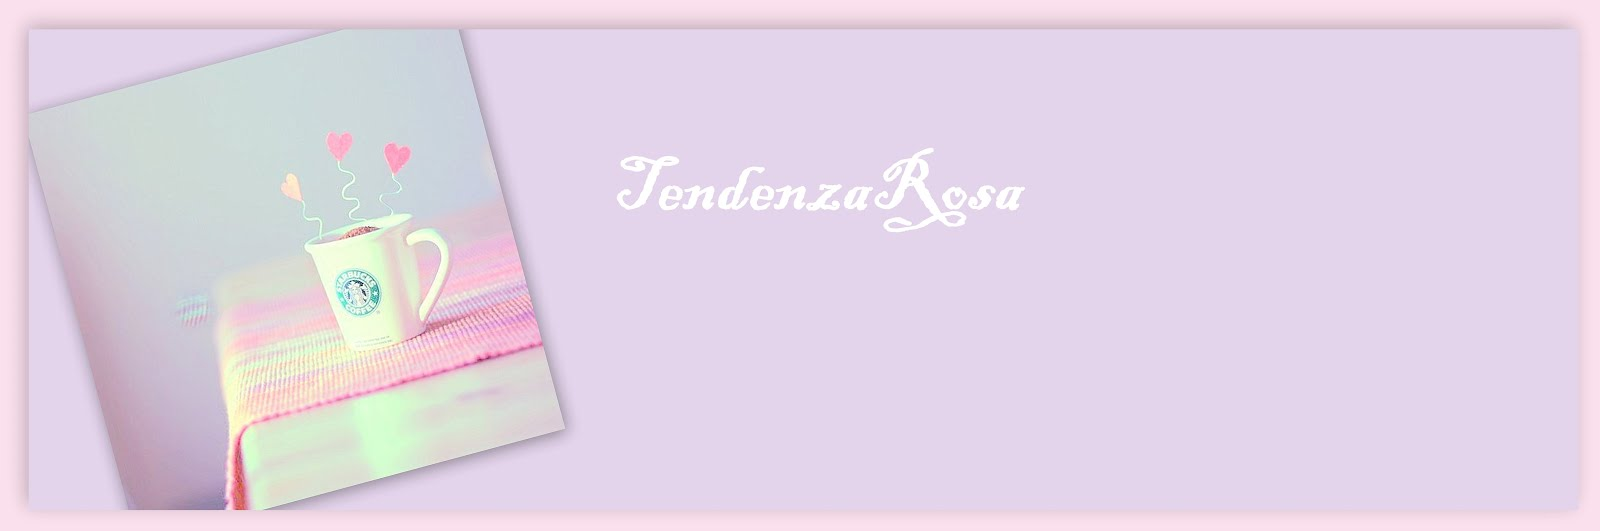 TendenzaRosa